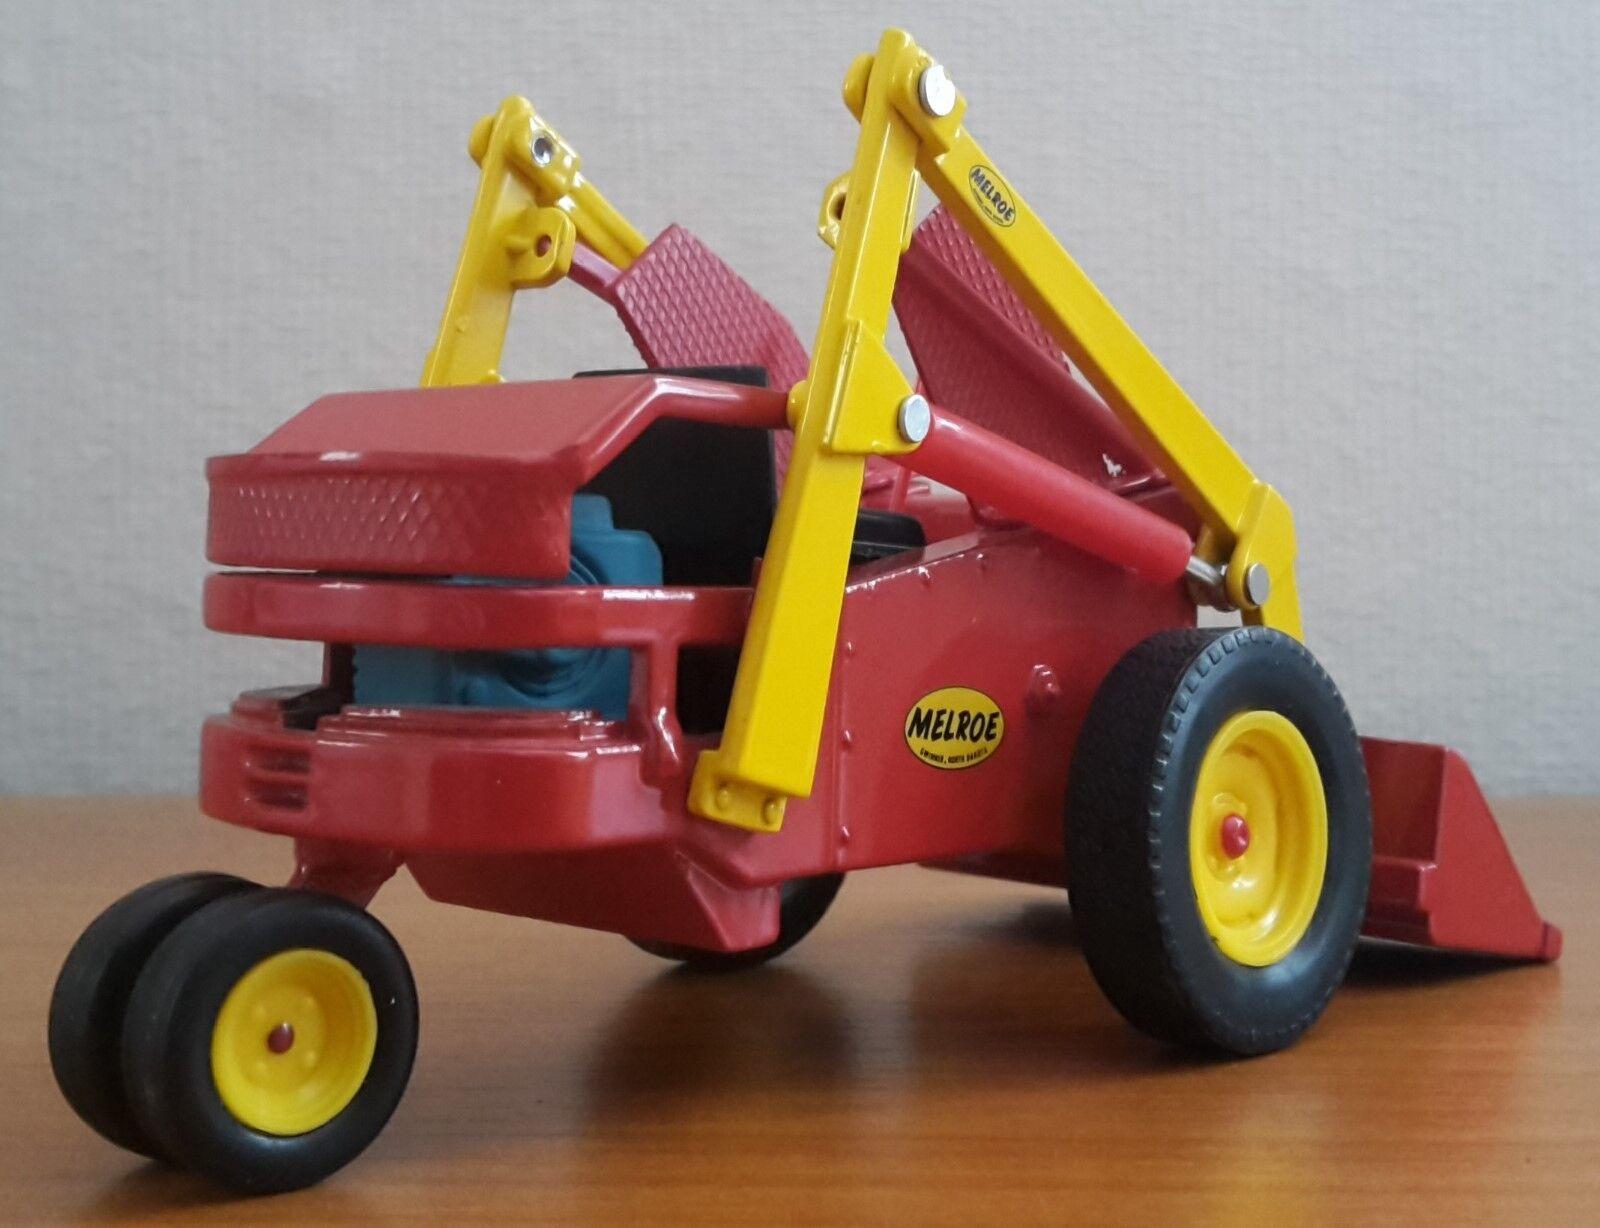 Spielzeug Melroe M-200 M-200 M-200 Classic Edition Kompaktlader Maßstab 1 25 Sammler NEU 123e9f